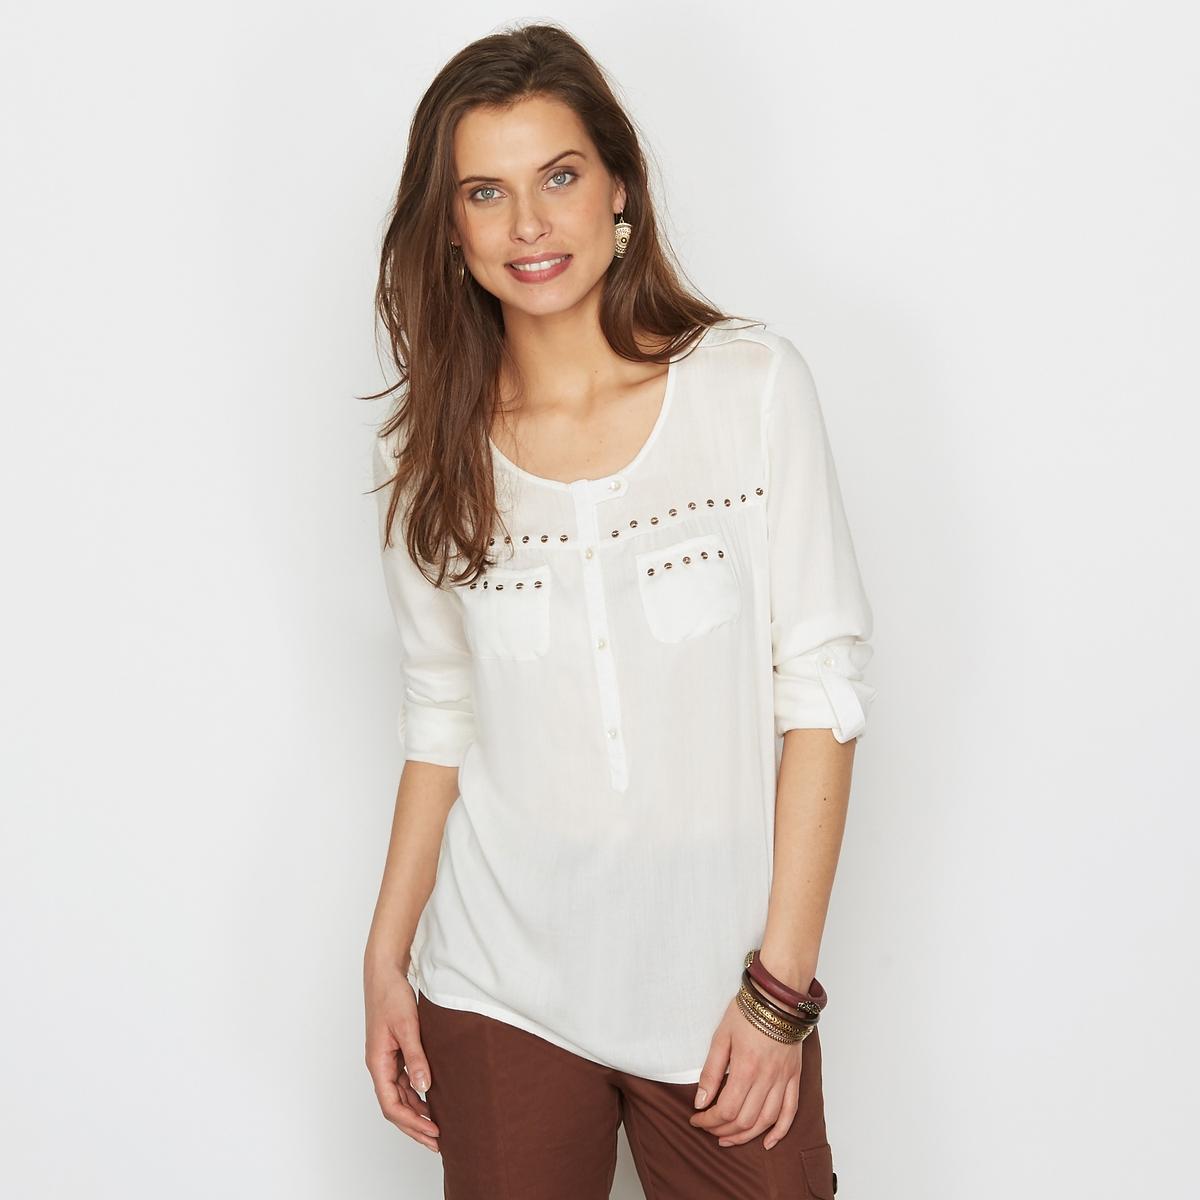 Блузка из струящейся ткани с отделкой блестками от ANNE WEYBURN